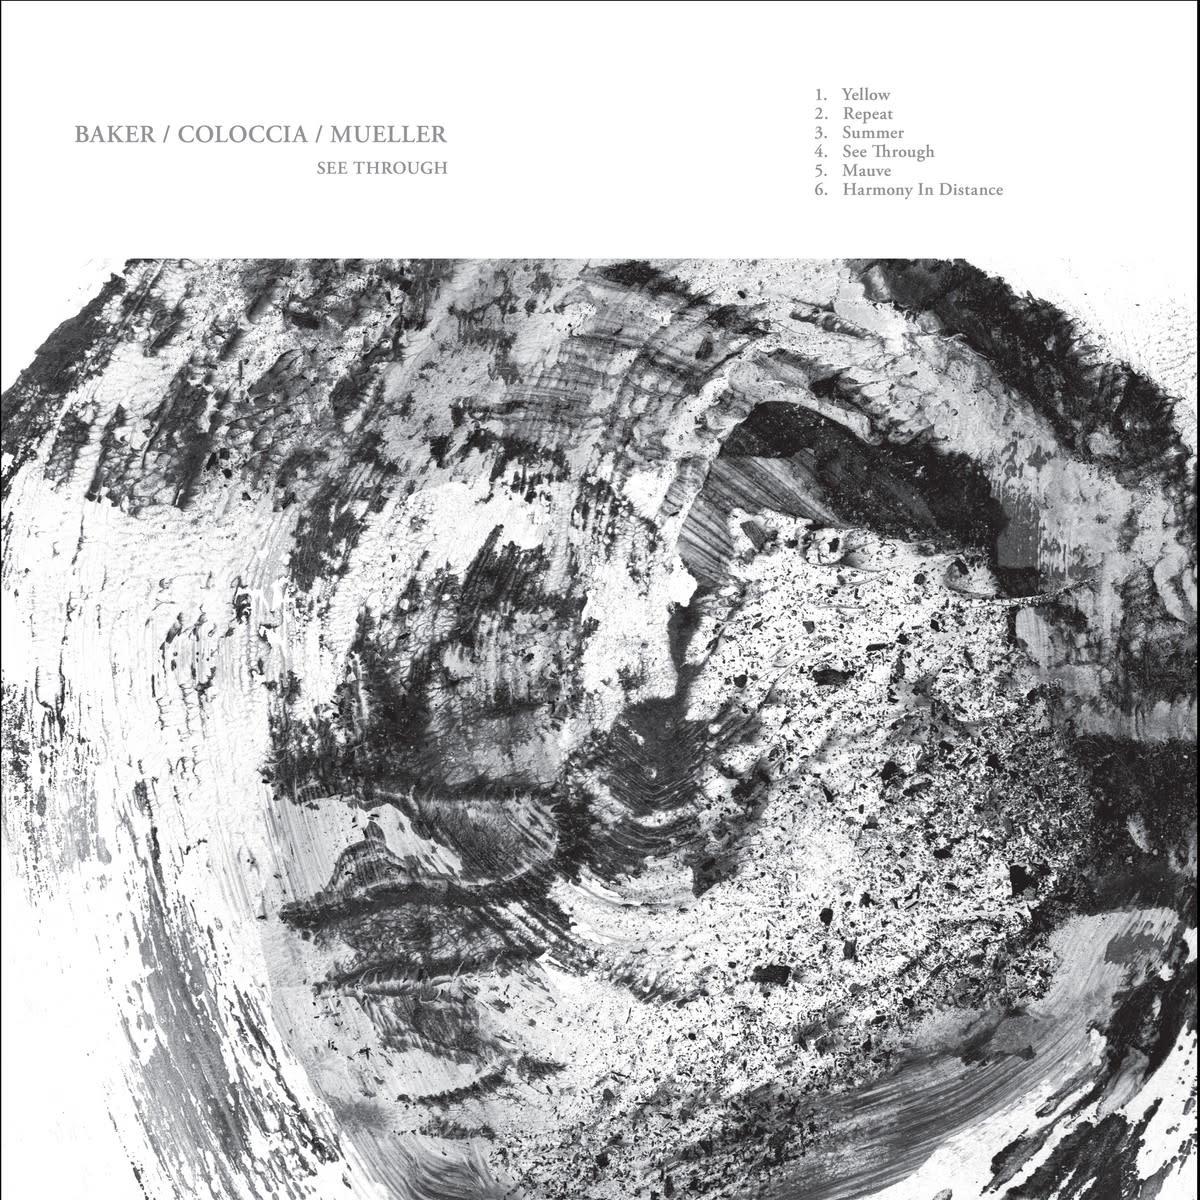 Gizeh Aidan Baker/Faith Coloccia/John Mueller - See Through